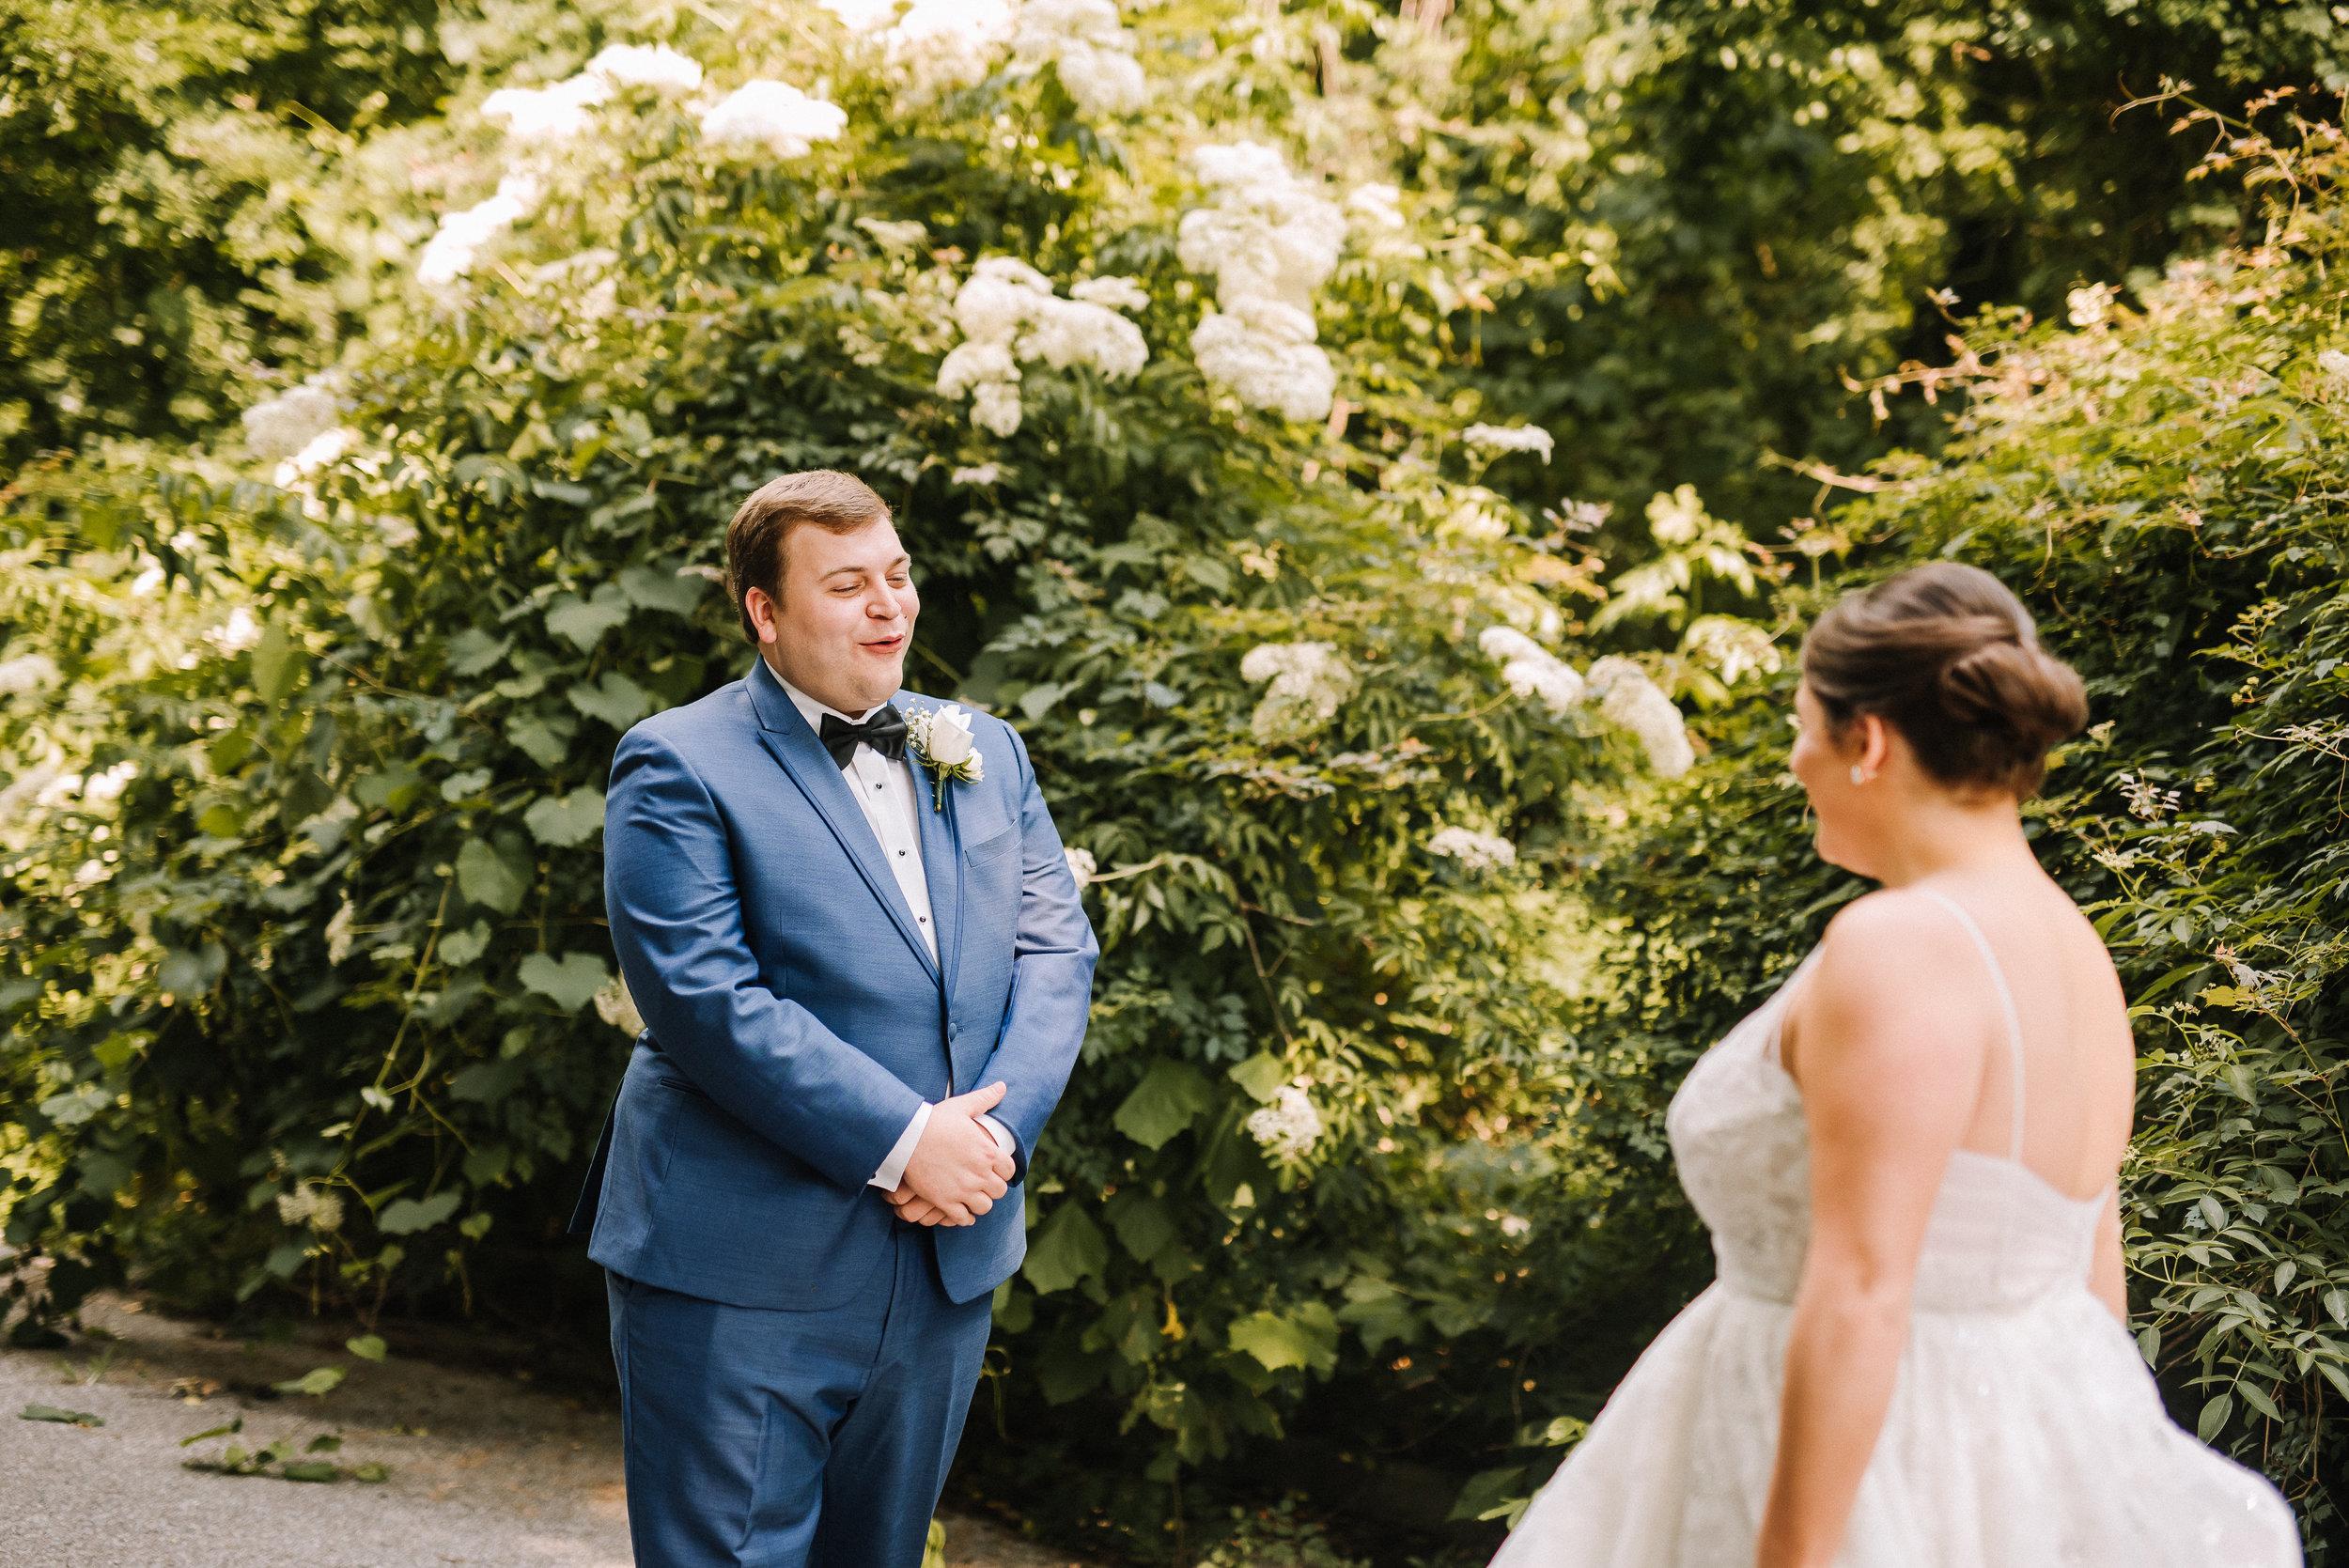 Smith Wedding_Memphis Zoo_Ashley Benham Photography-168.jpg